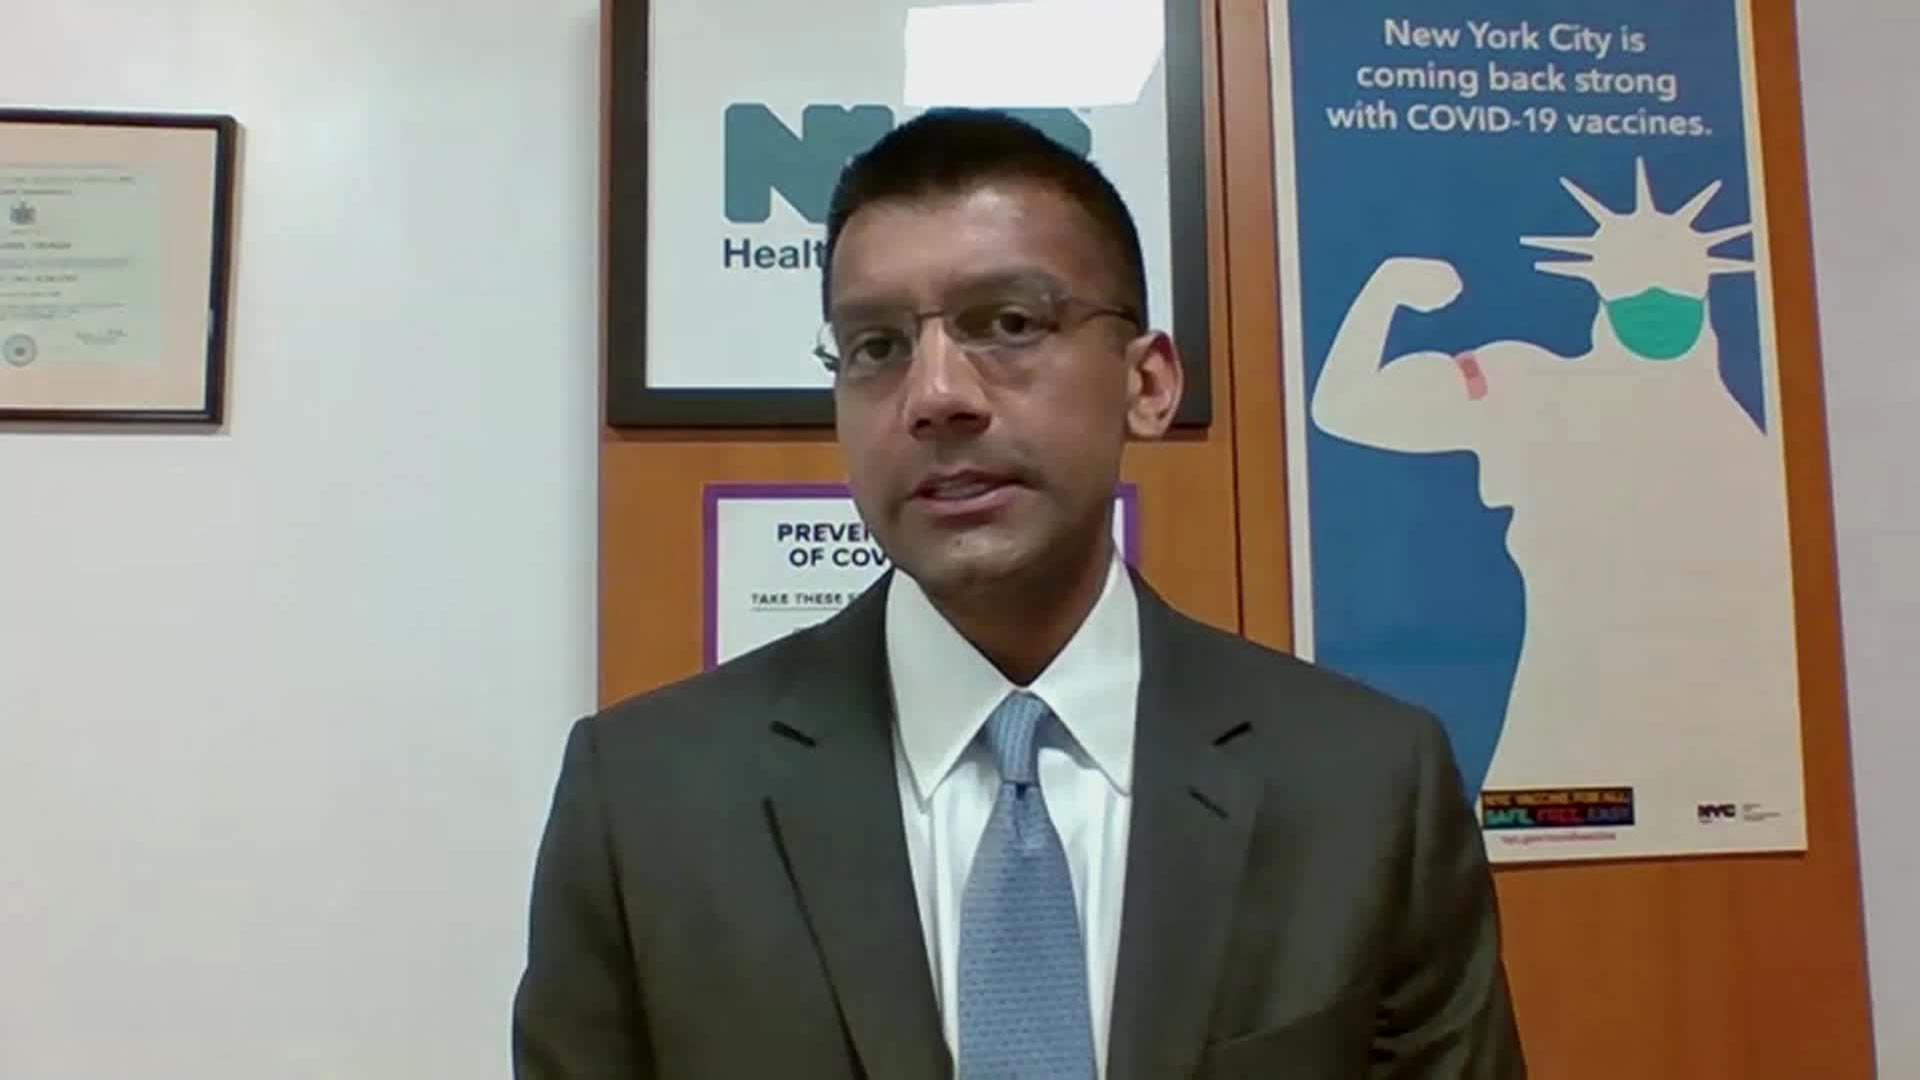 New York City Health Commissioner David Chokshi speaks with CNN on Monday, January 25.